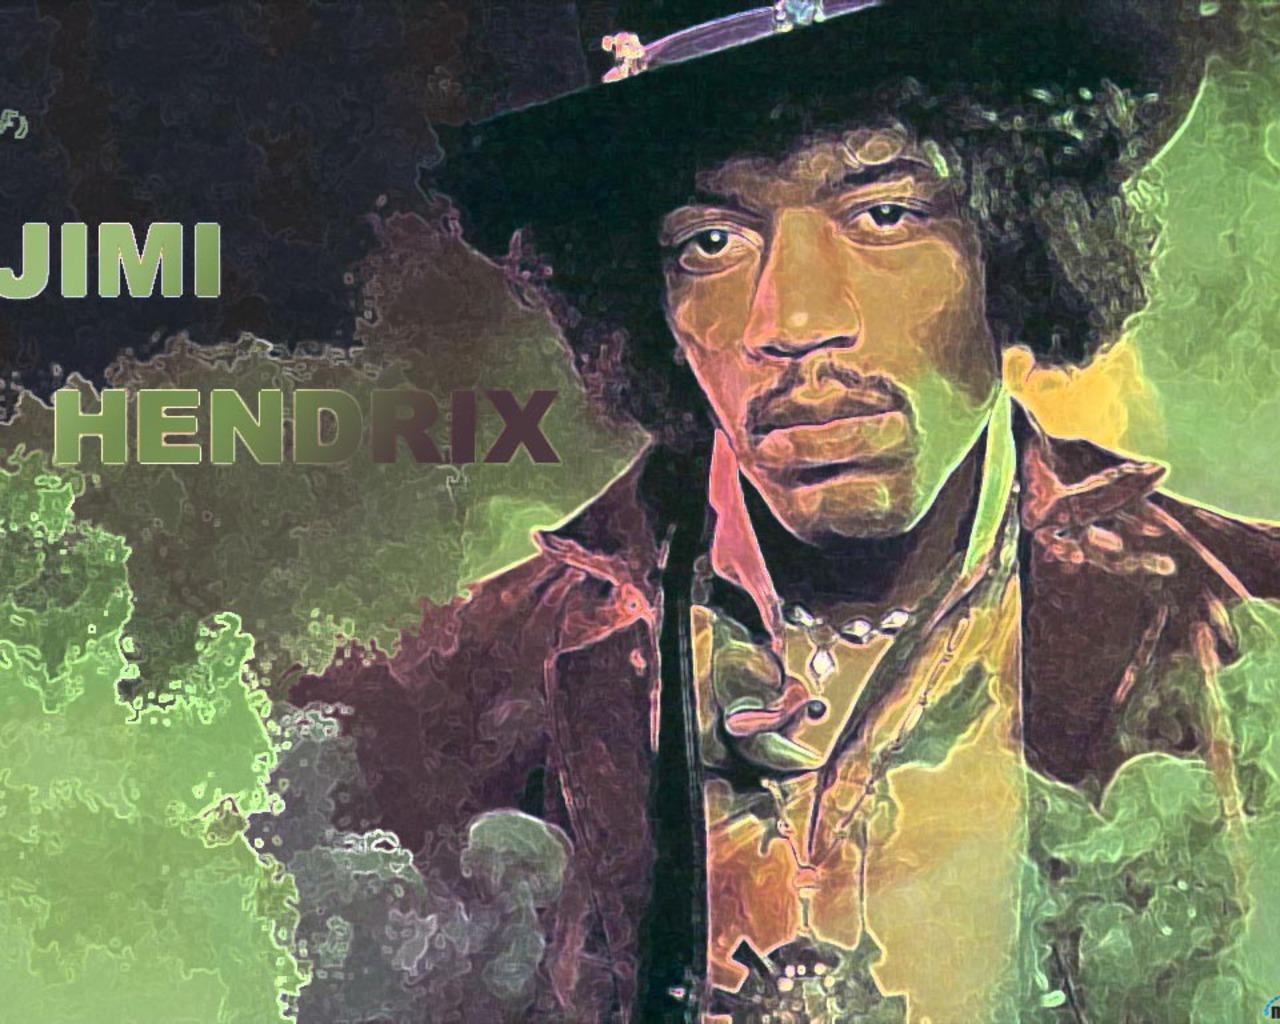 Jimi Hendrix Wallpaper   Classic Rock Wallpaper 20405230 1280x1024